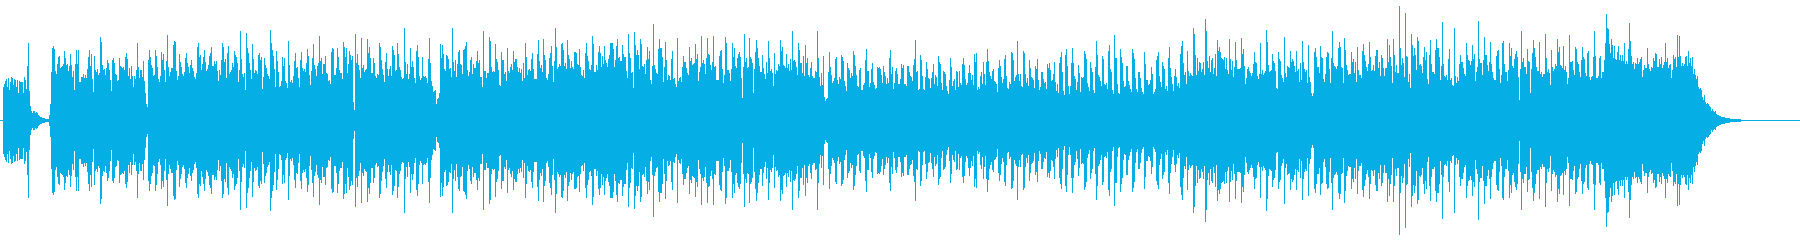 Accordianサウンドとチュー...の再生済みの波形